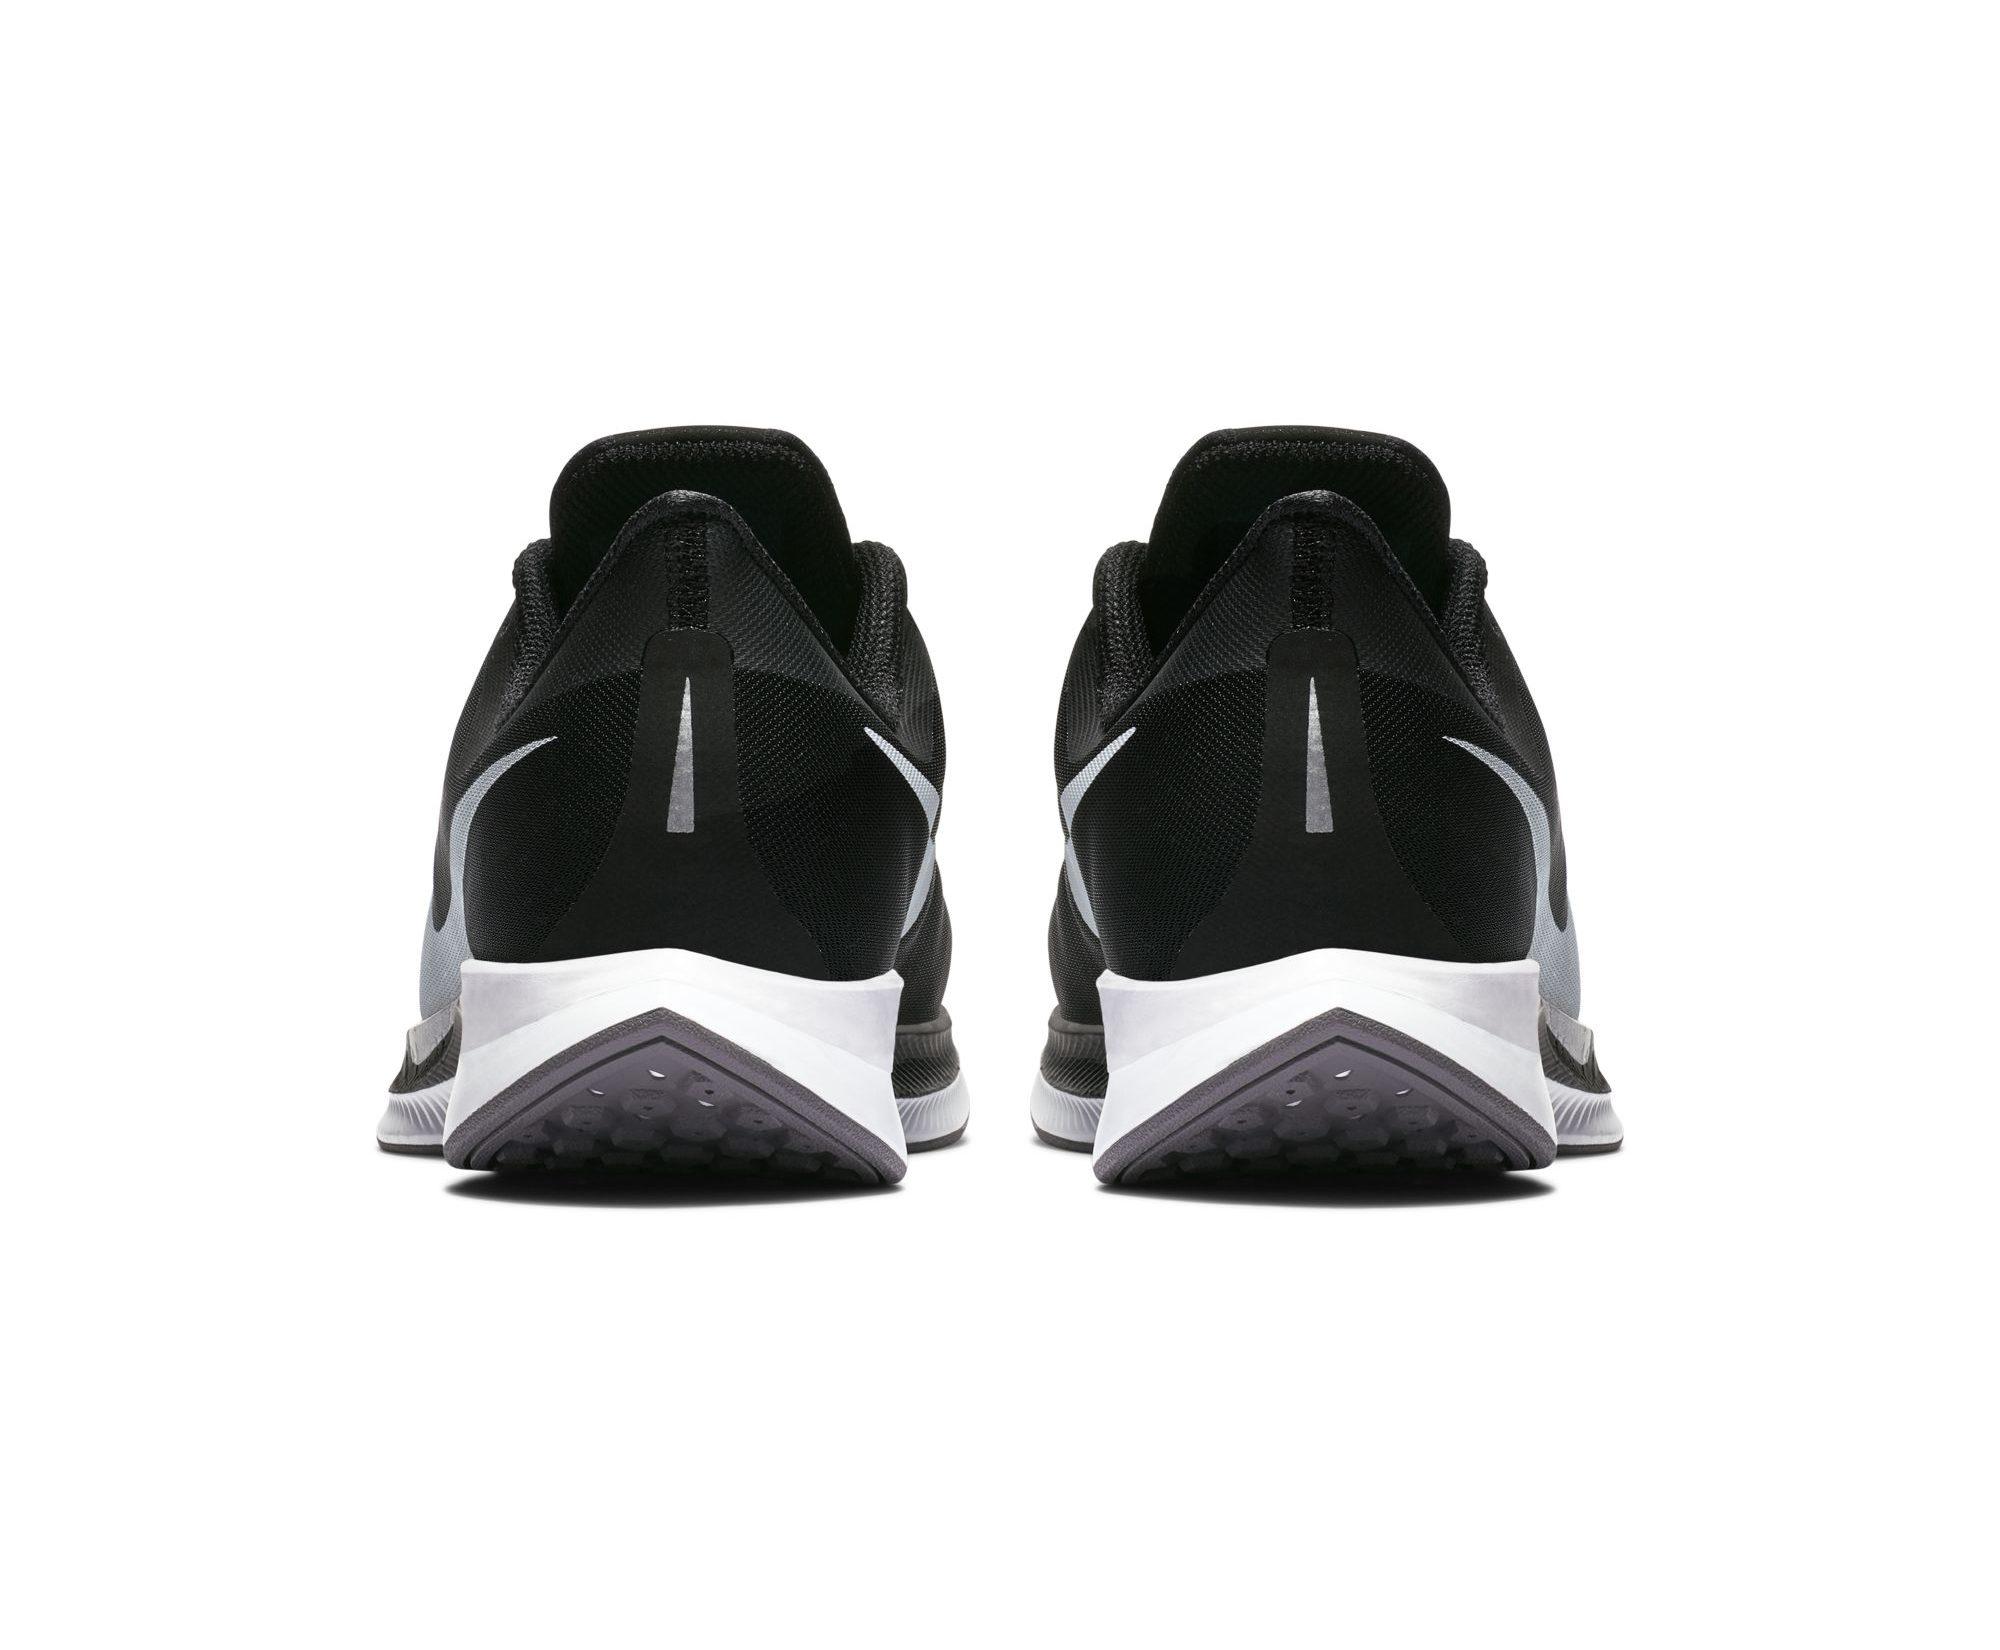 cca78f5ccdd929 nike zoom pegasus turbo heel - WearTesters